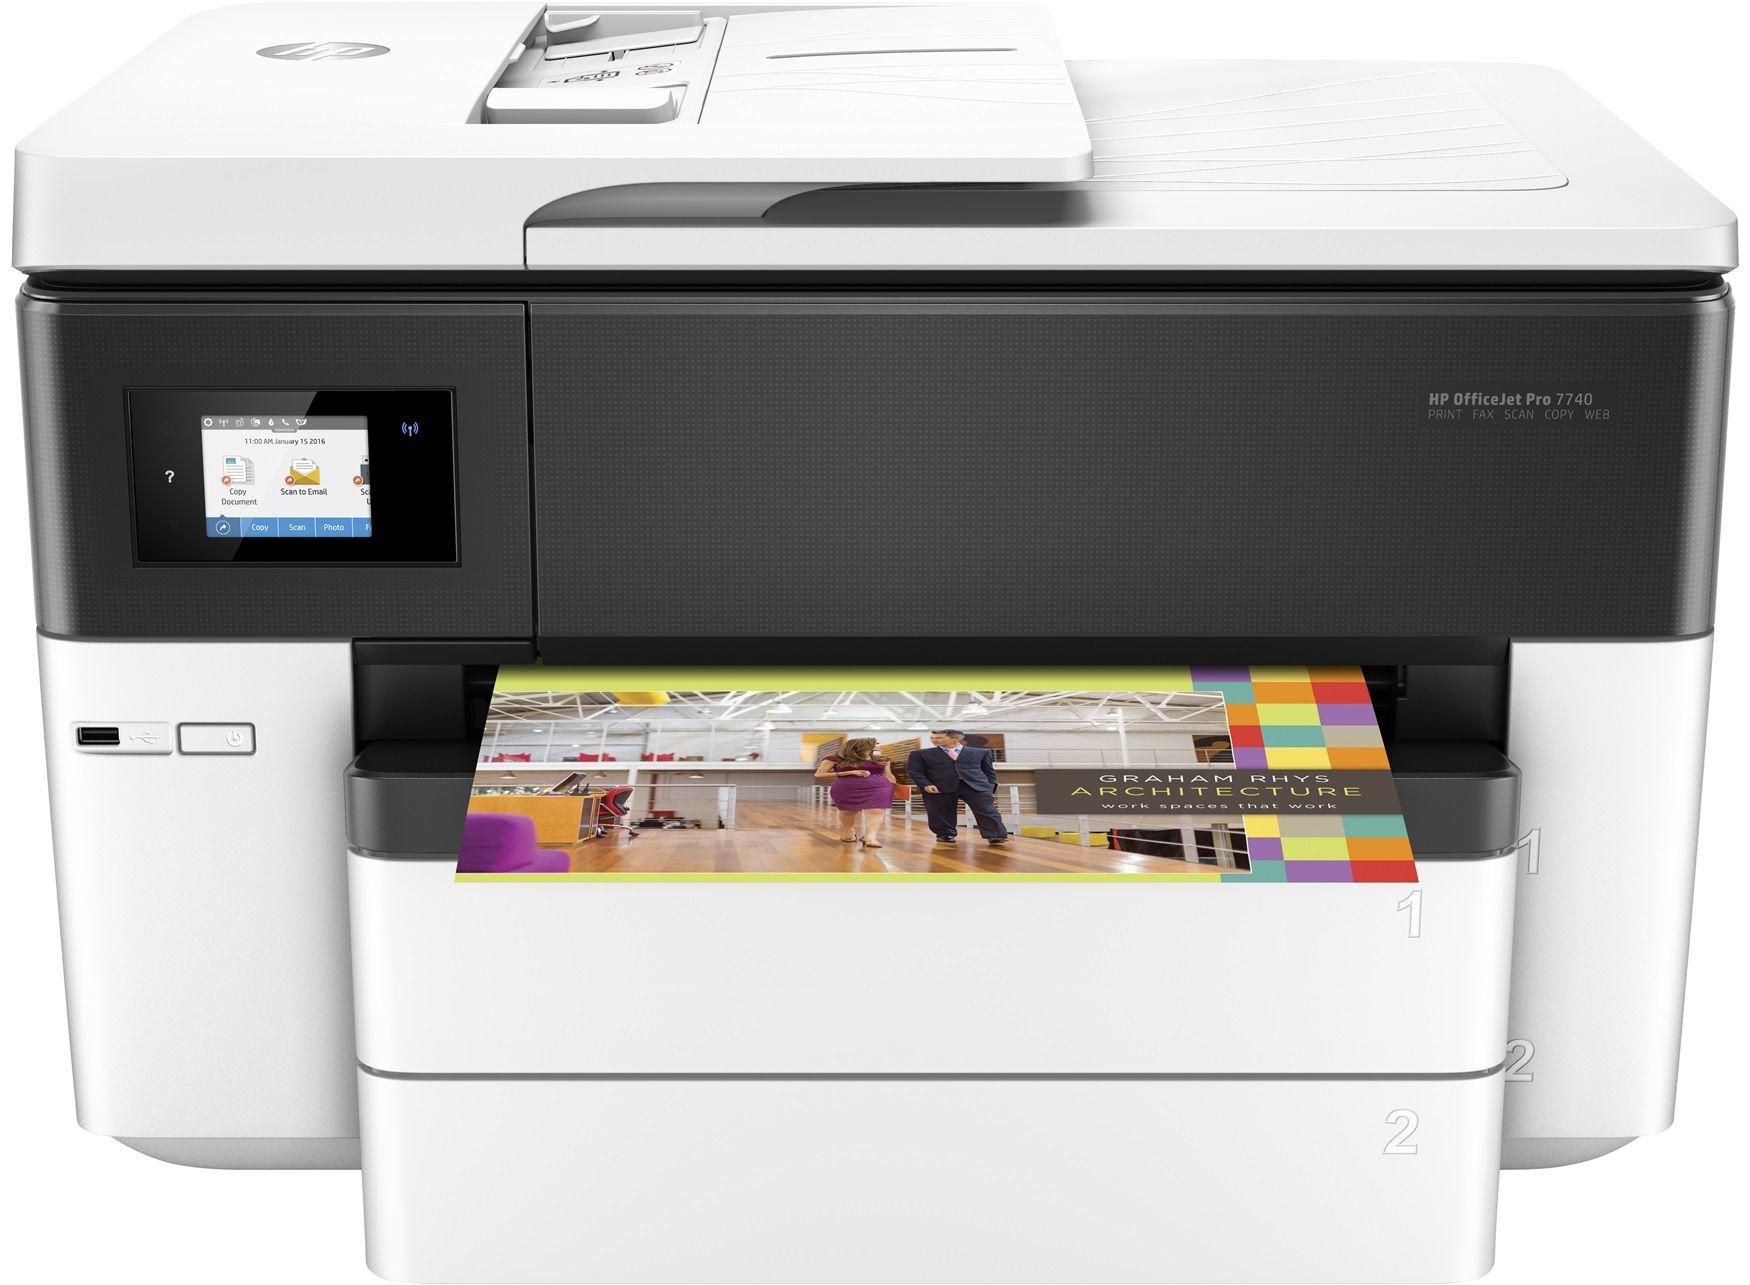 HP OfficeJet Pro 7740 A3 printer £121.32 Printerland + £60 HP cashback